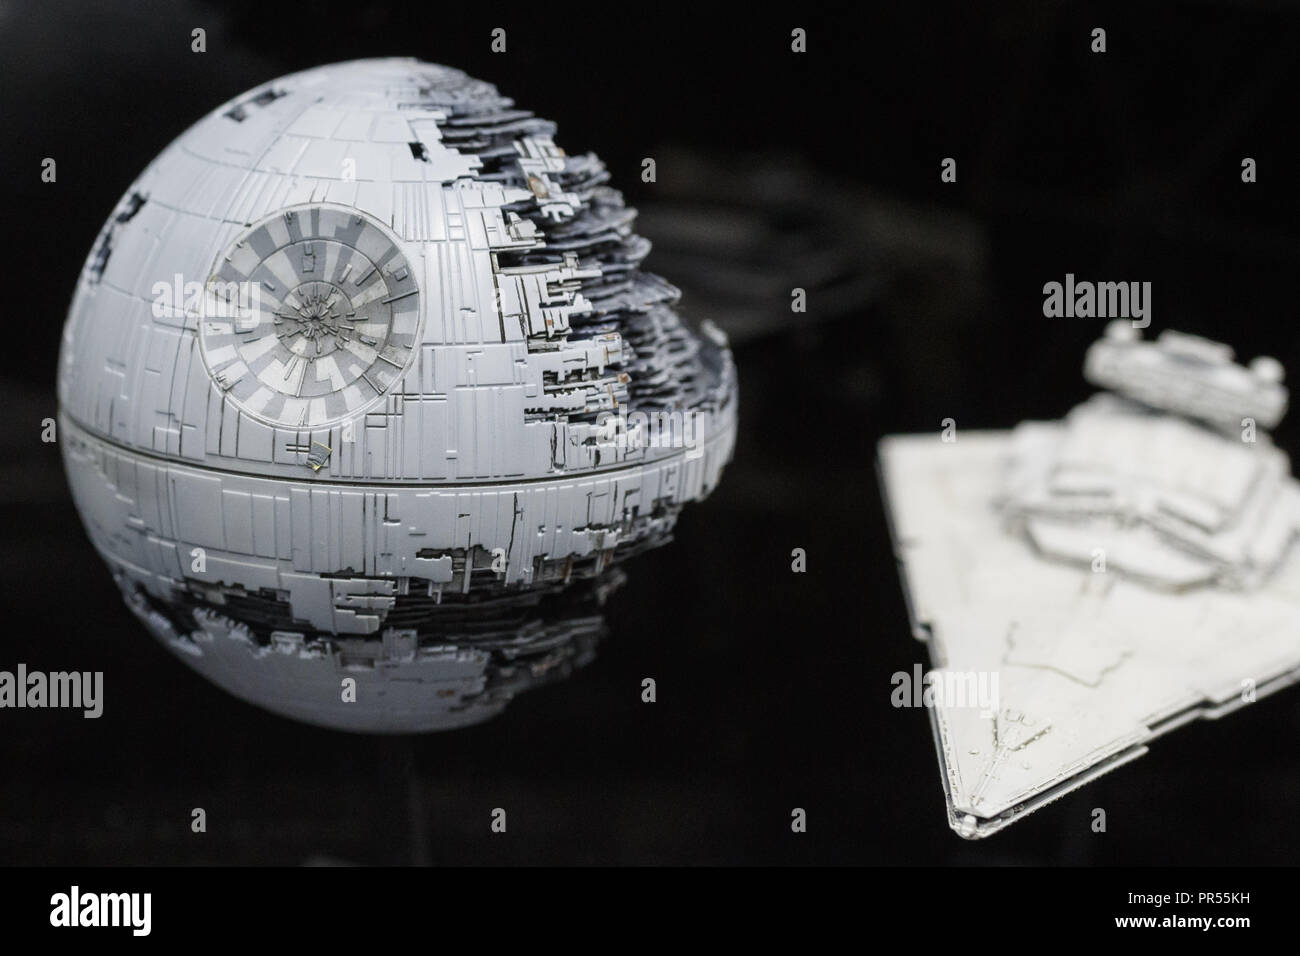 Tokyo, Japan  29th Sep, 2018  A Bandai Star Wars plastic